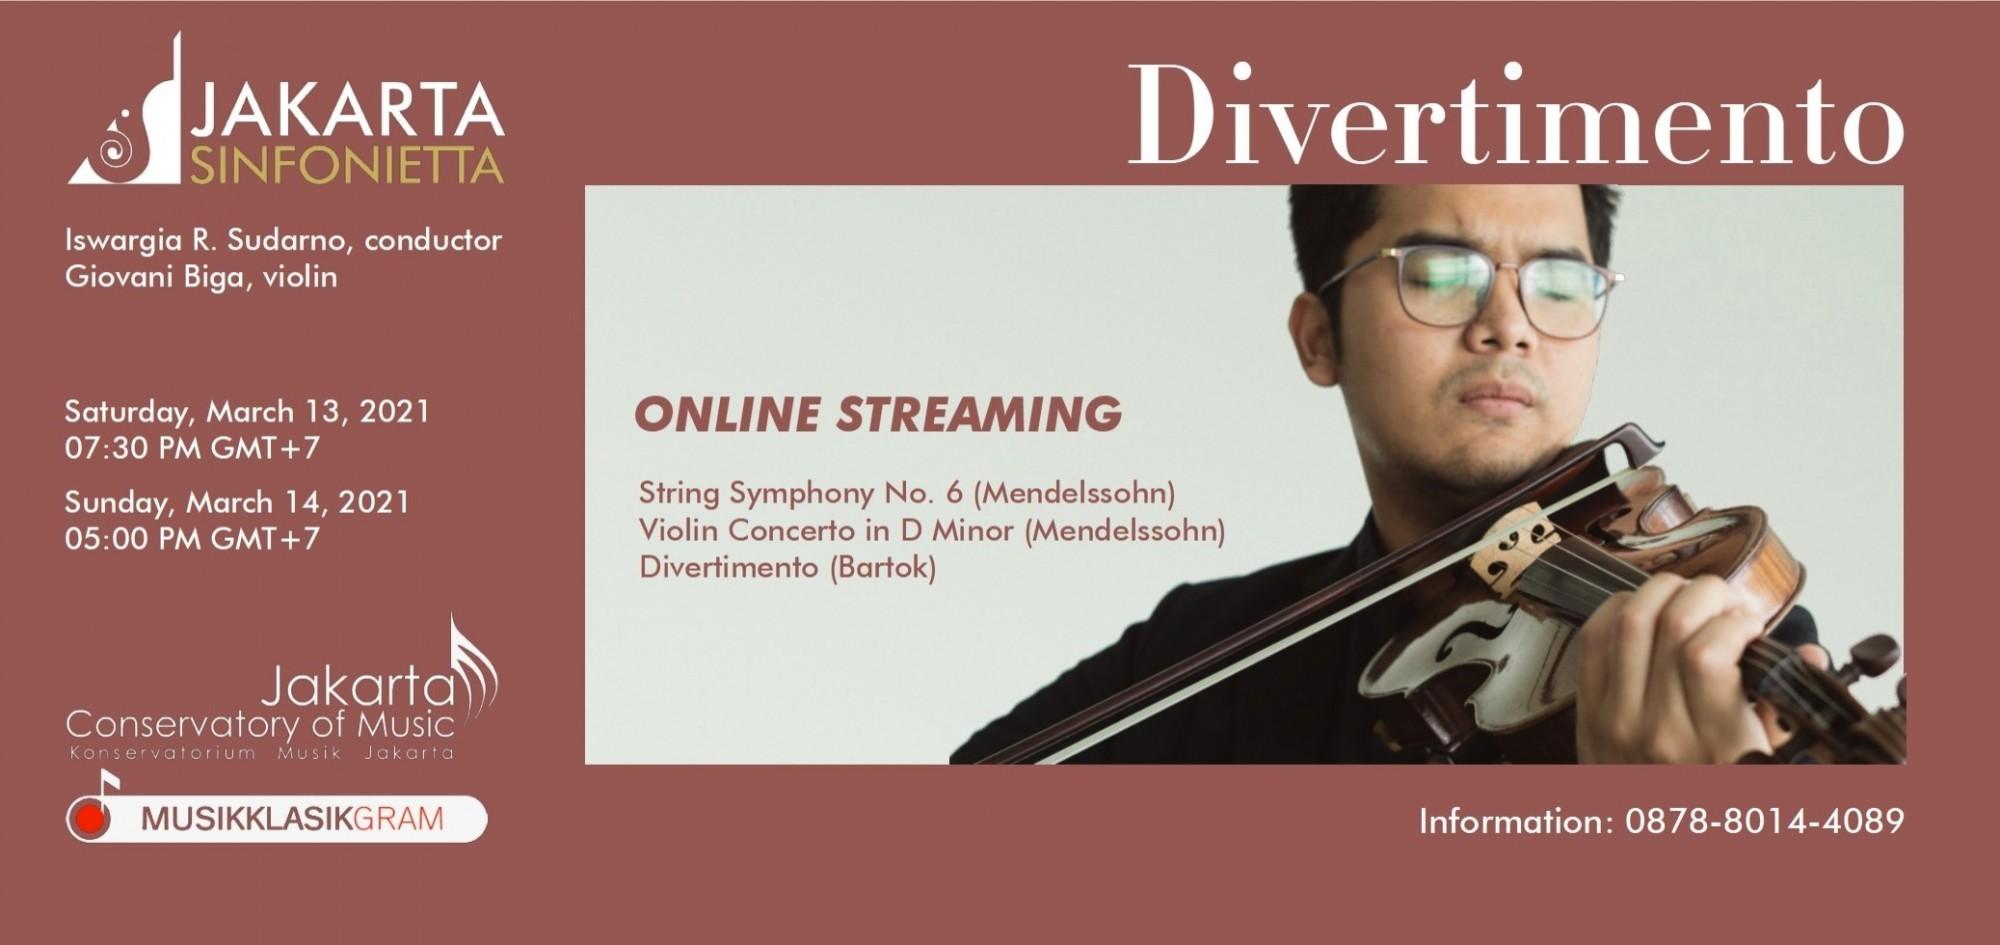 Jakarta Sinfonietta & Giovani Biga - Divertimento (13 March 2021)